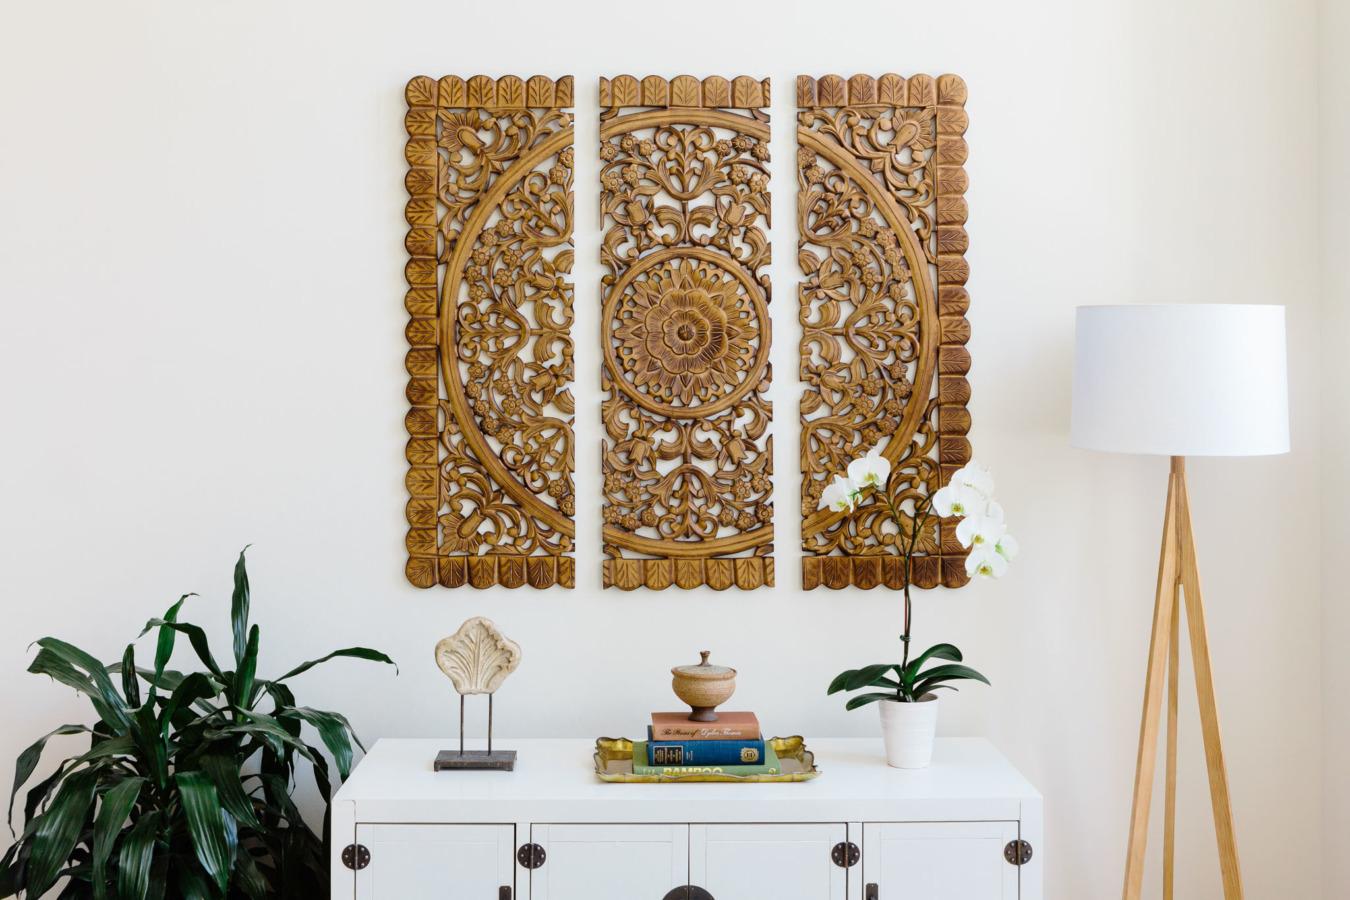 woodland imports 3 piece wall decor set copy cat chic. Black Bedroom Furniture Sets. Home Design Ideas